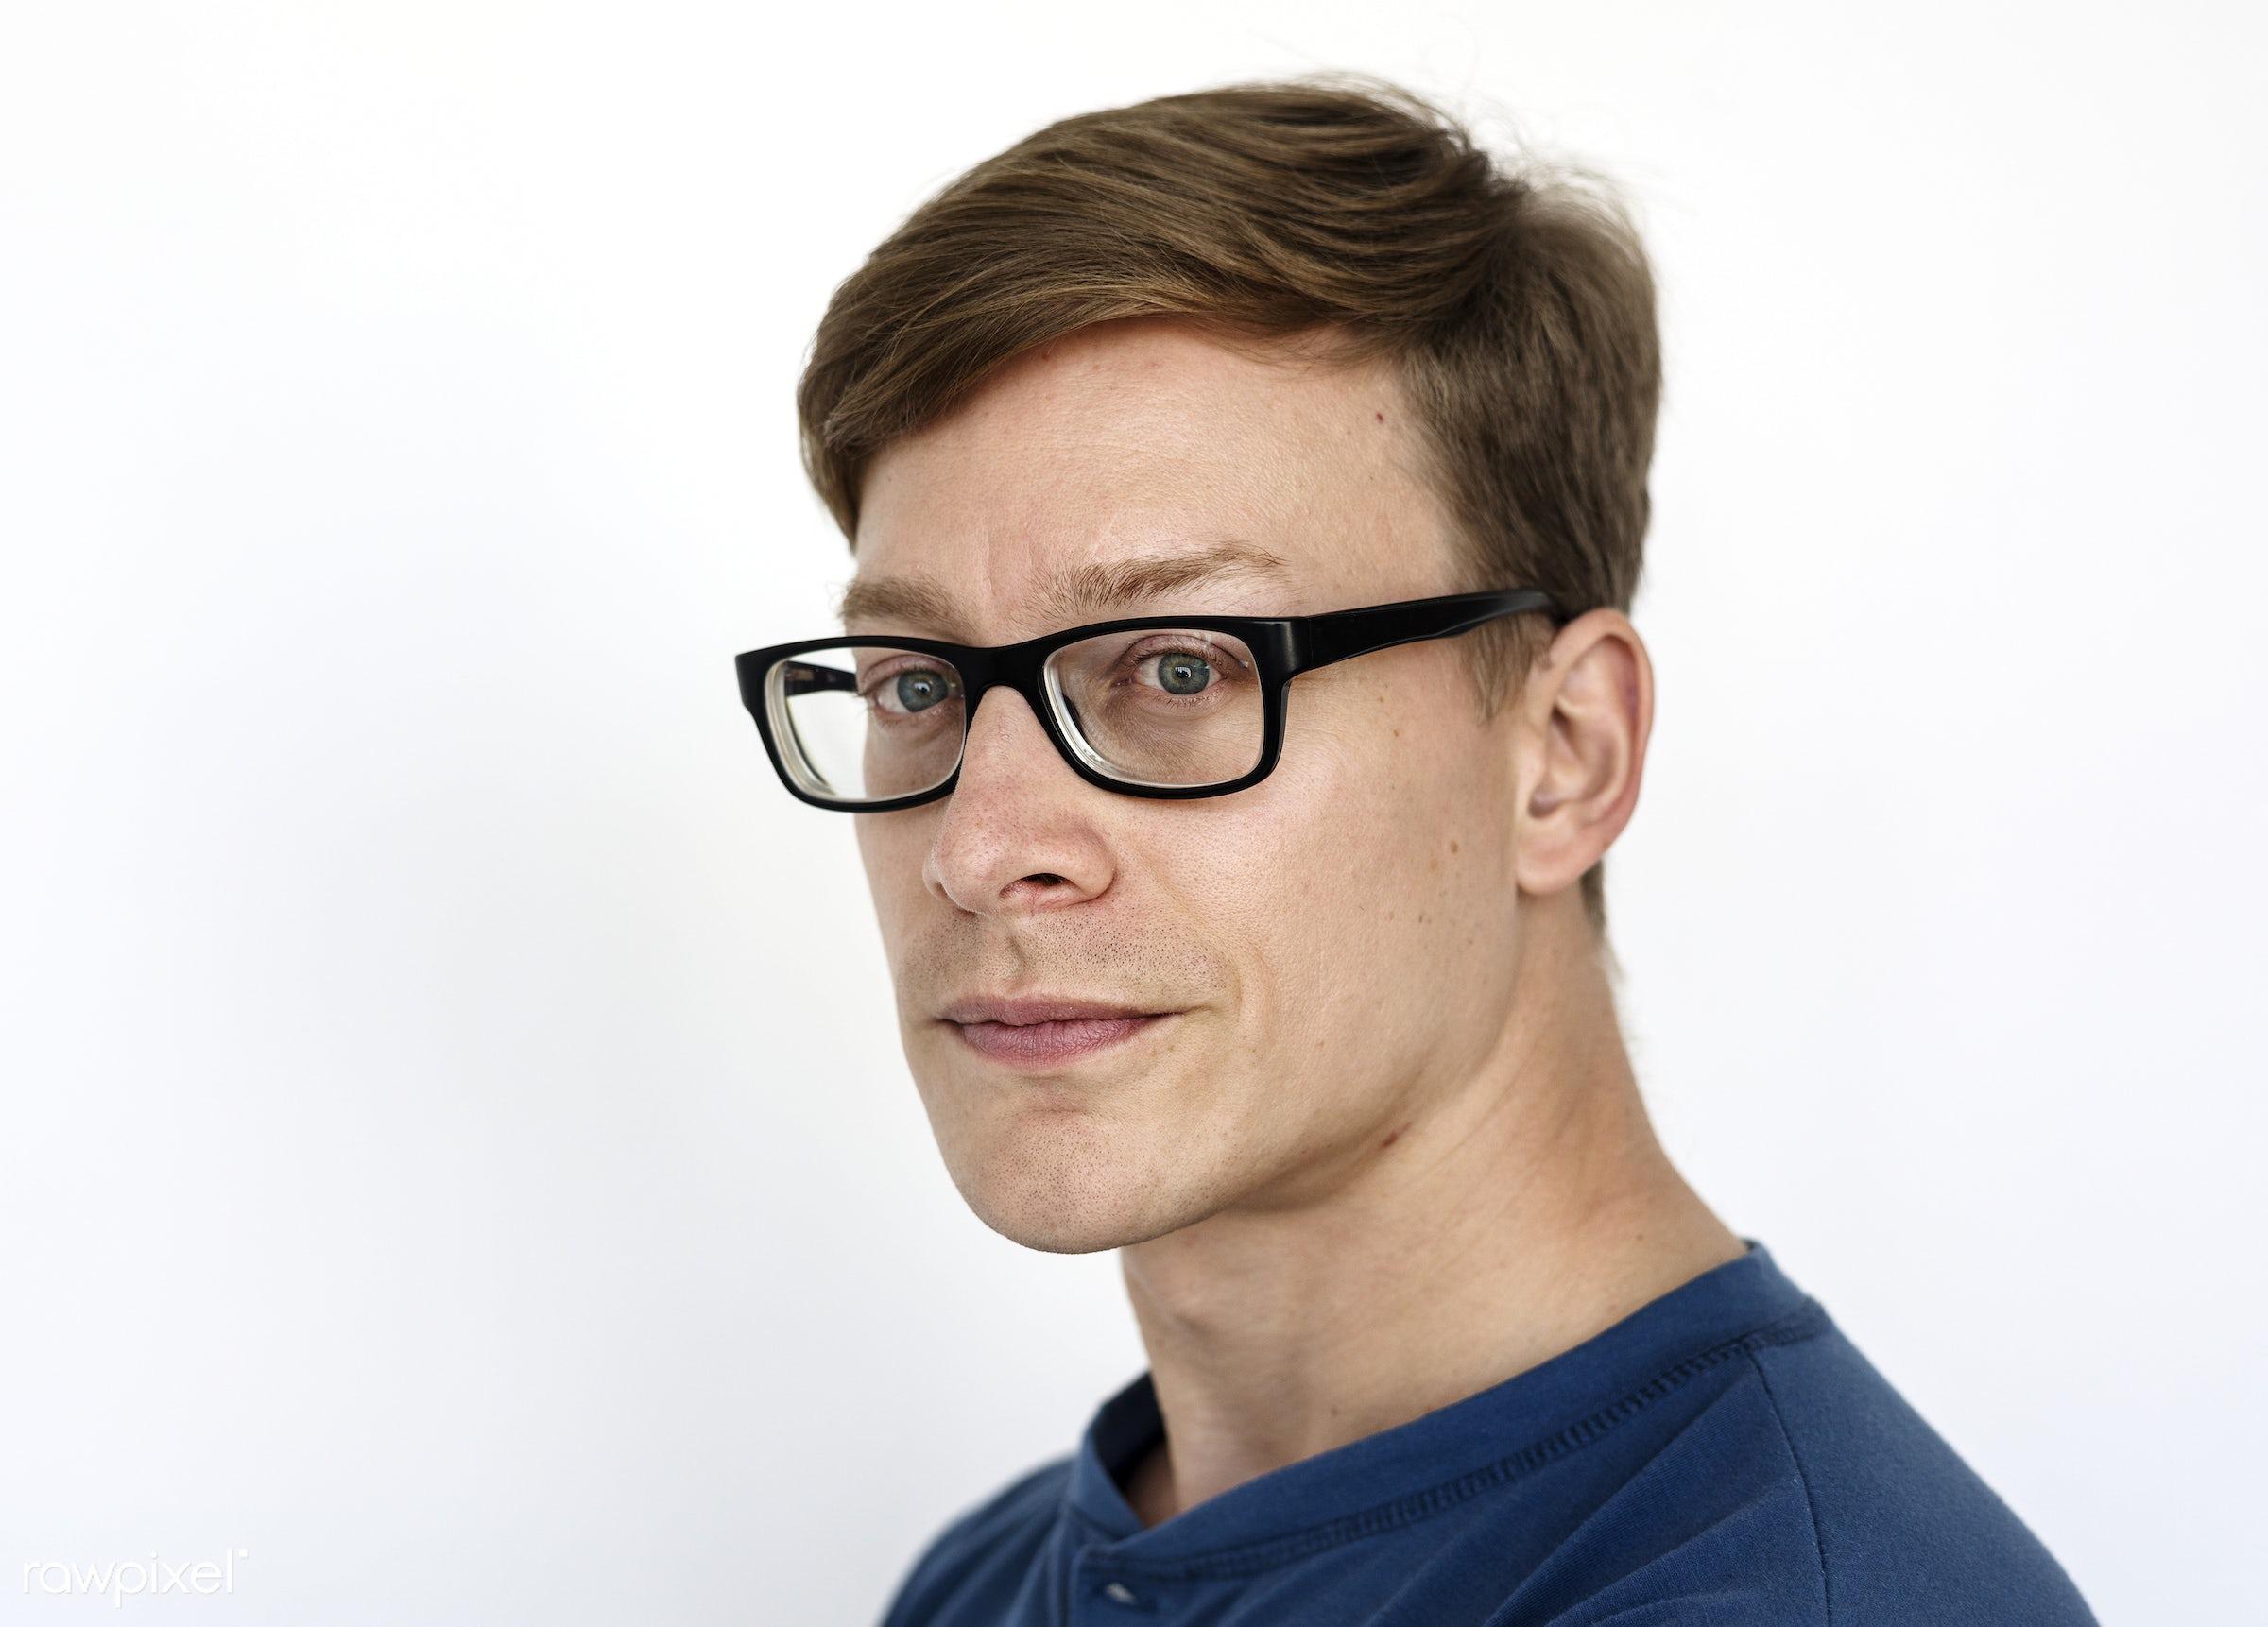 Portrait of an Austrian man - adult, alone, american, austria, austrian, beard, casual, caucasian, cheerful, closeup,...